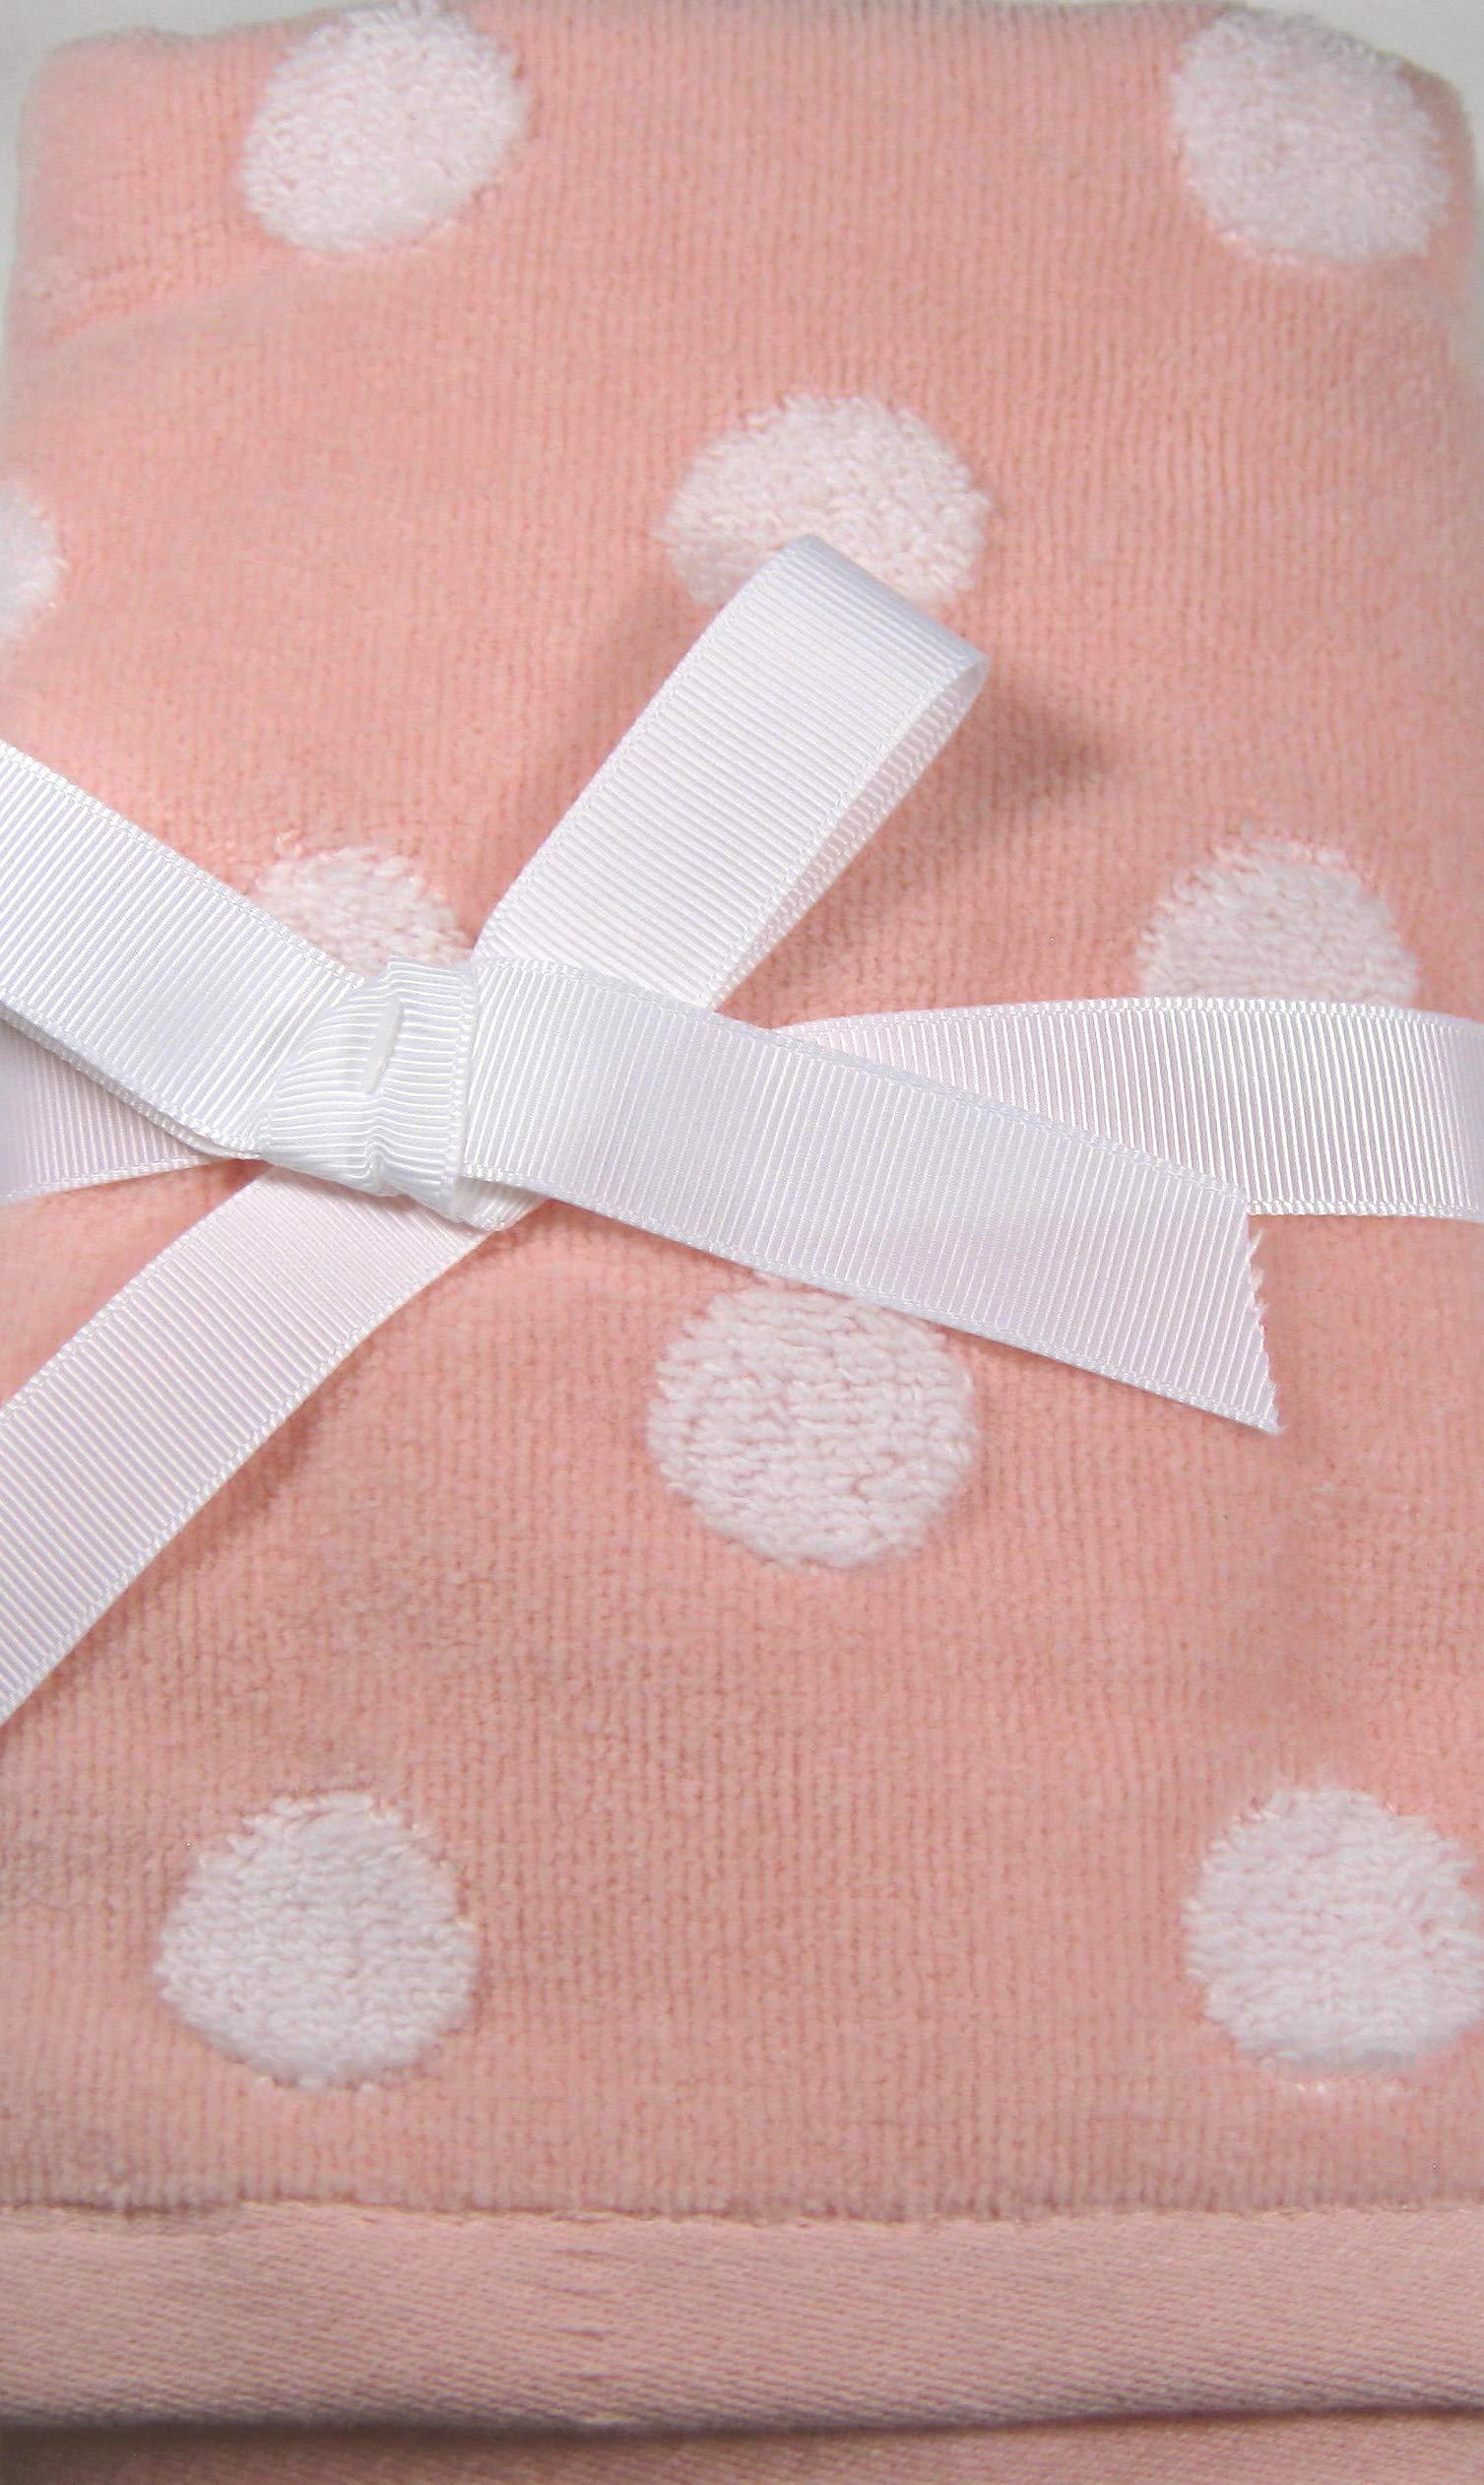 Plush, Decorative Polka Dot Finger Tip Towel Set Light Coral and White 100% Cotton